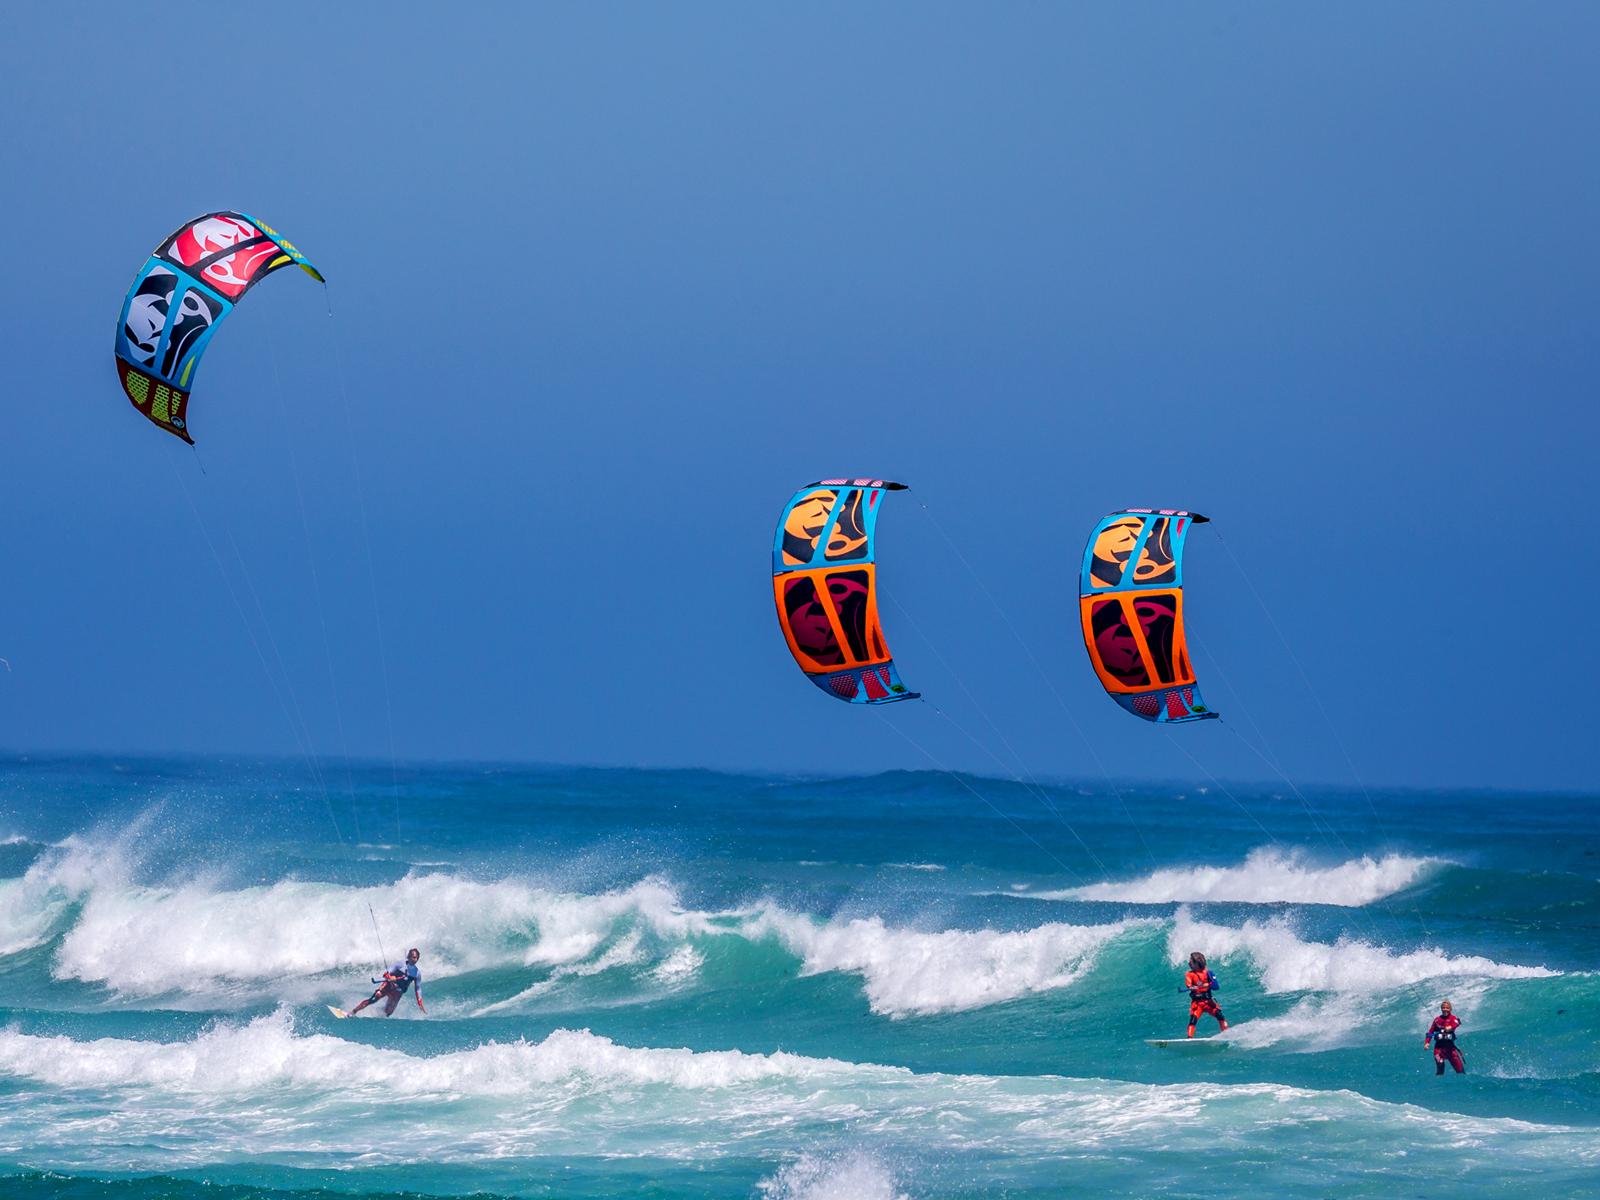 kitesurf wallpaper image - RRD squad taking over this wave on 2015 Religion kites - RRD Kiteboarding - in resolution: Standard 4:3 1600 X 1200